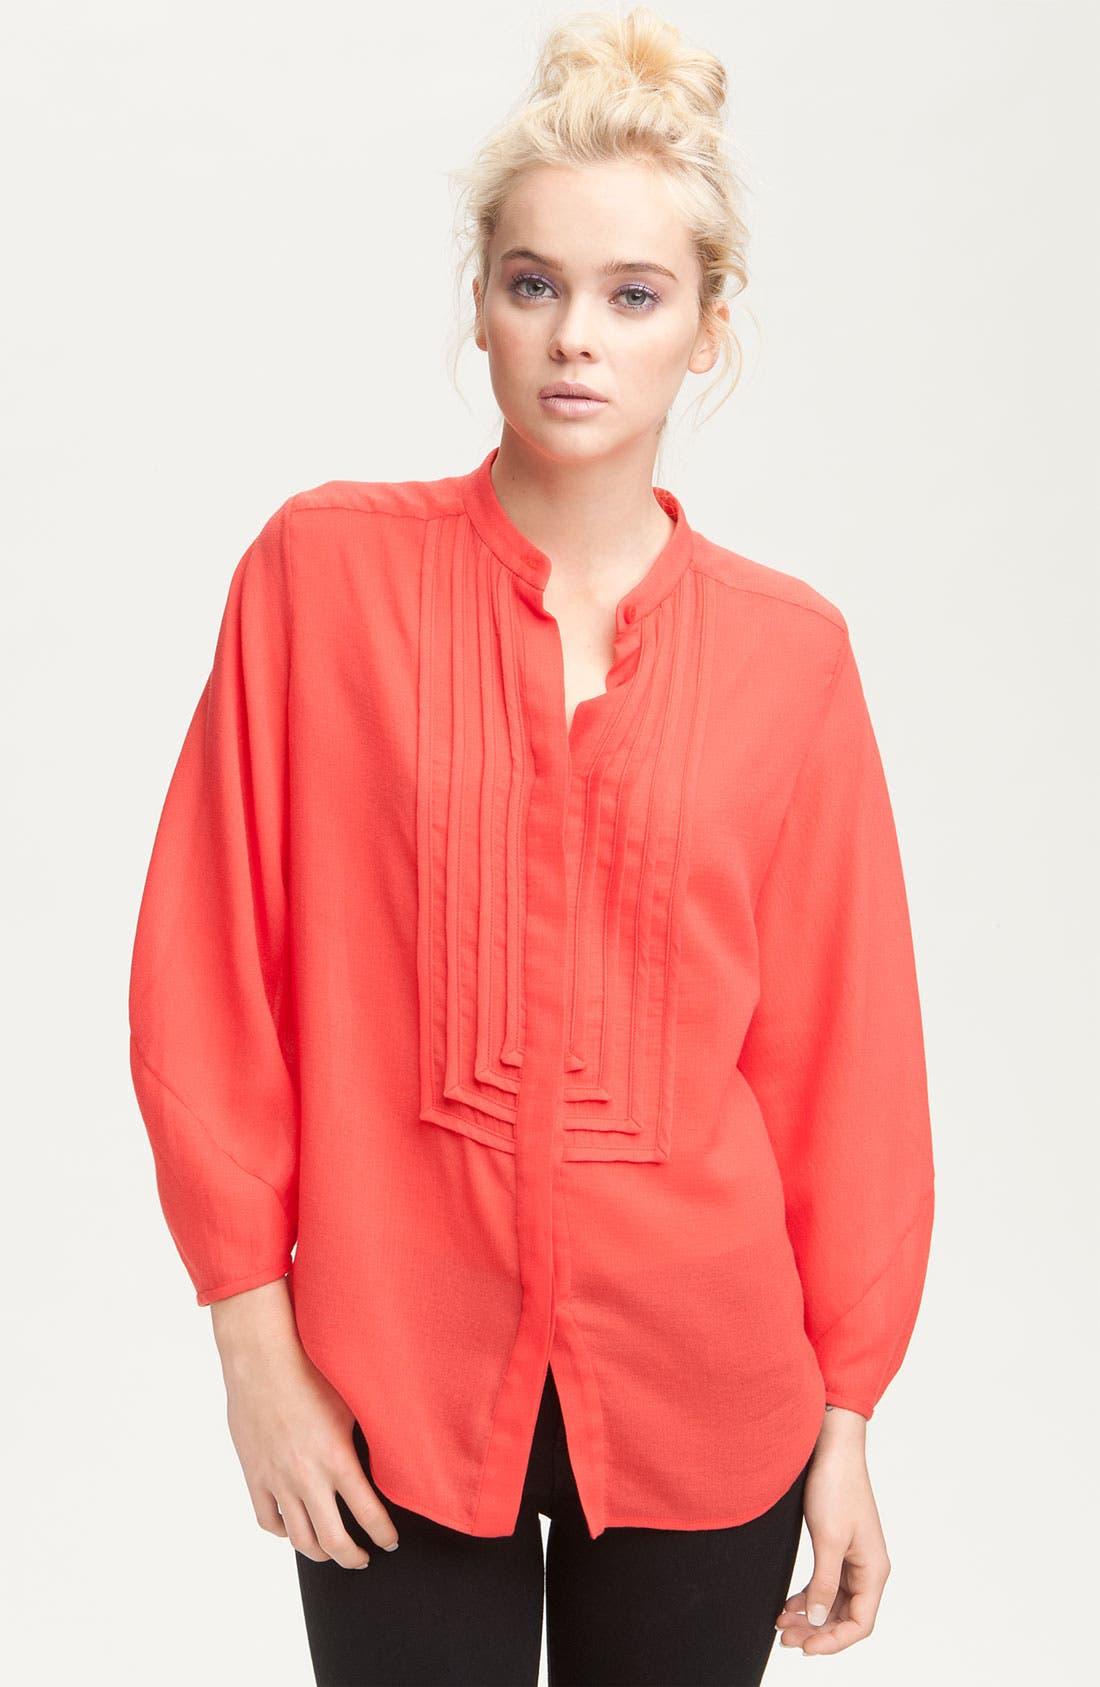 Main Image - Diane von Furstenberg 'Hatti' Oversized Mandarin Collar Tuxedo Shirt